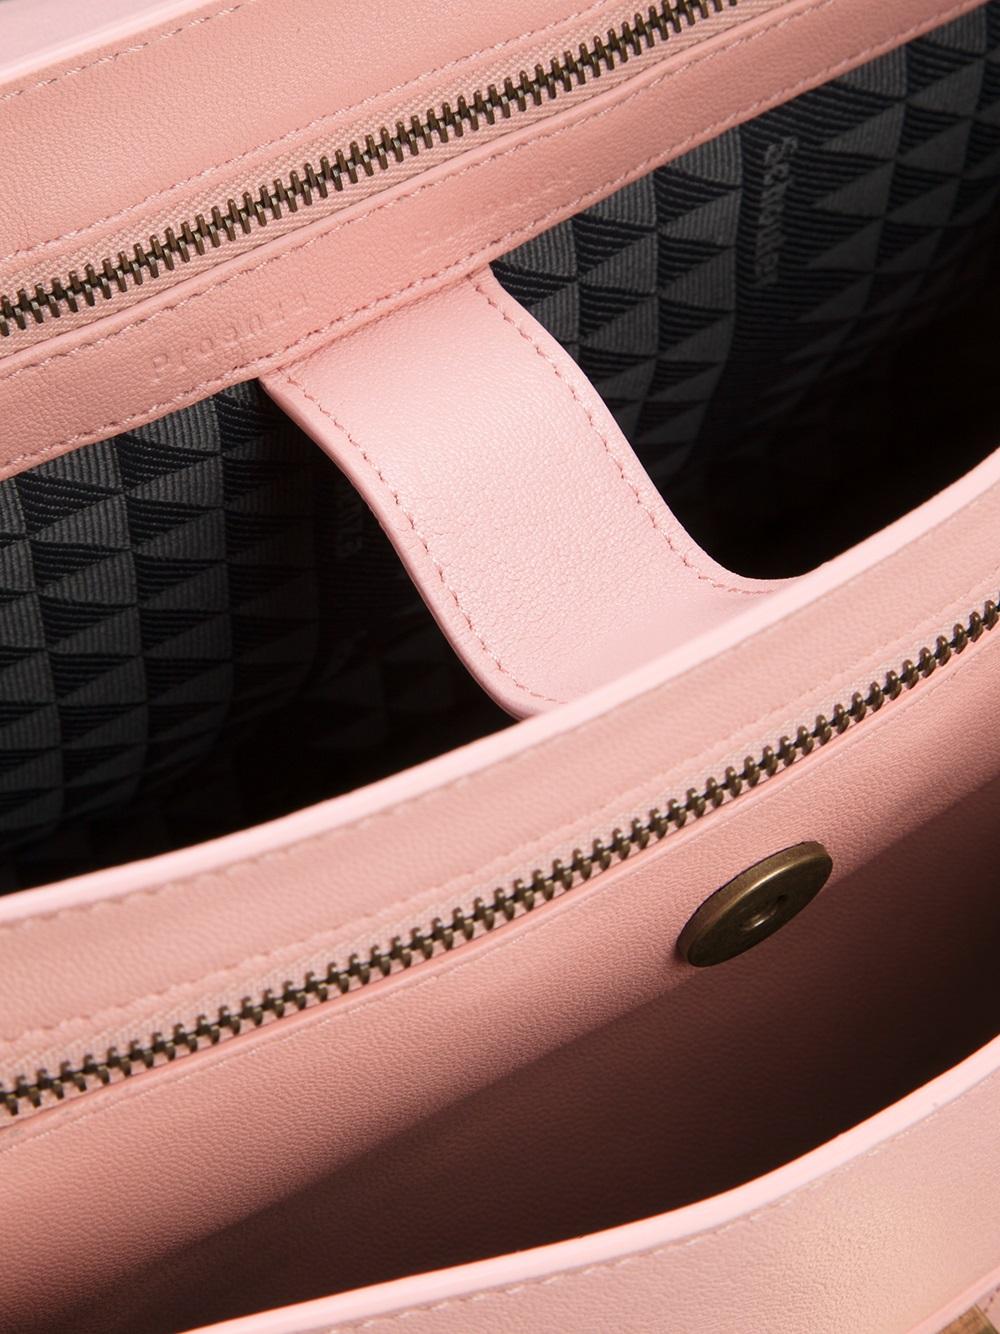 7920da2138 Lyst - Proenza Schouler Ps1 Medium Satchel in Pink